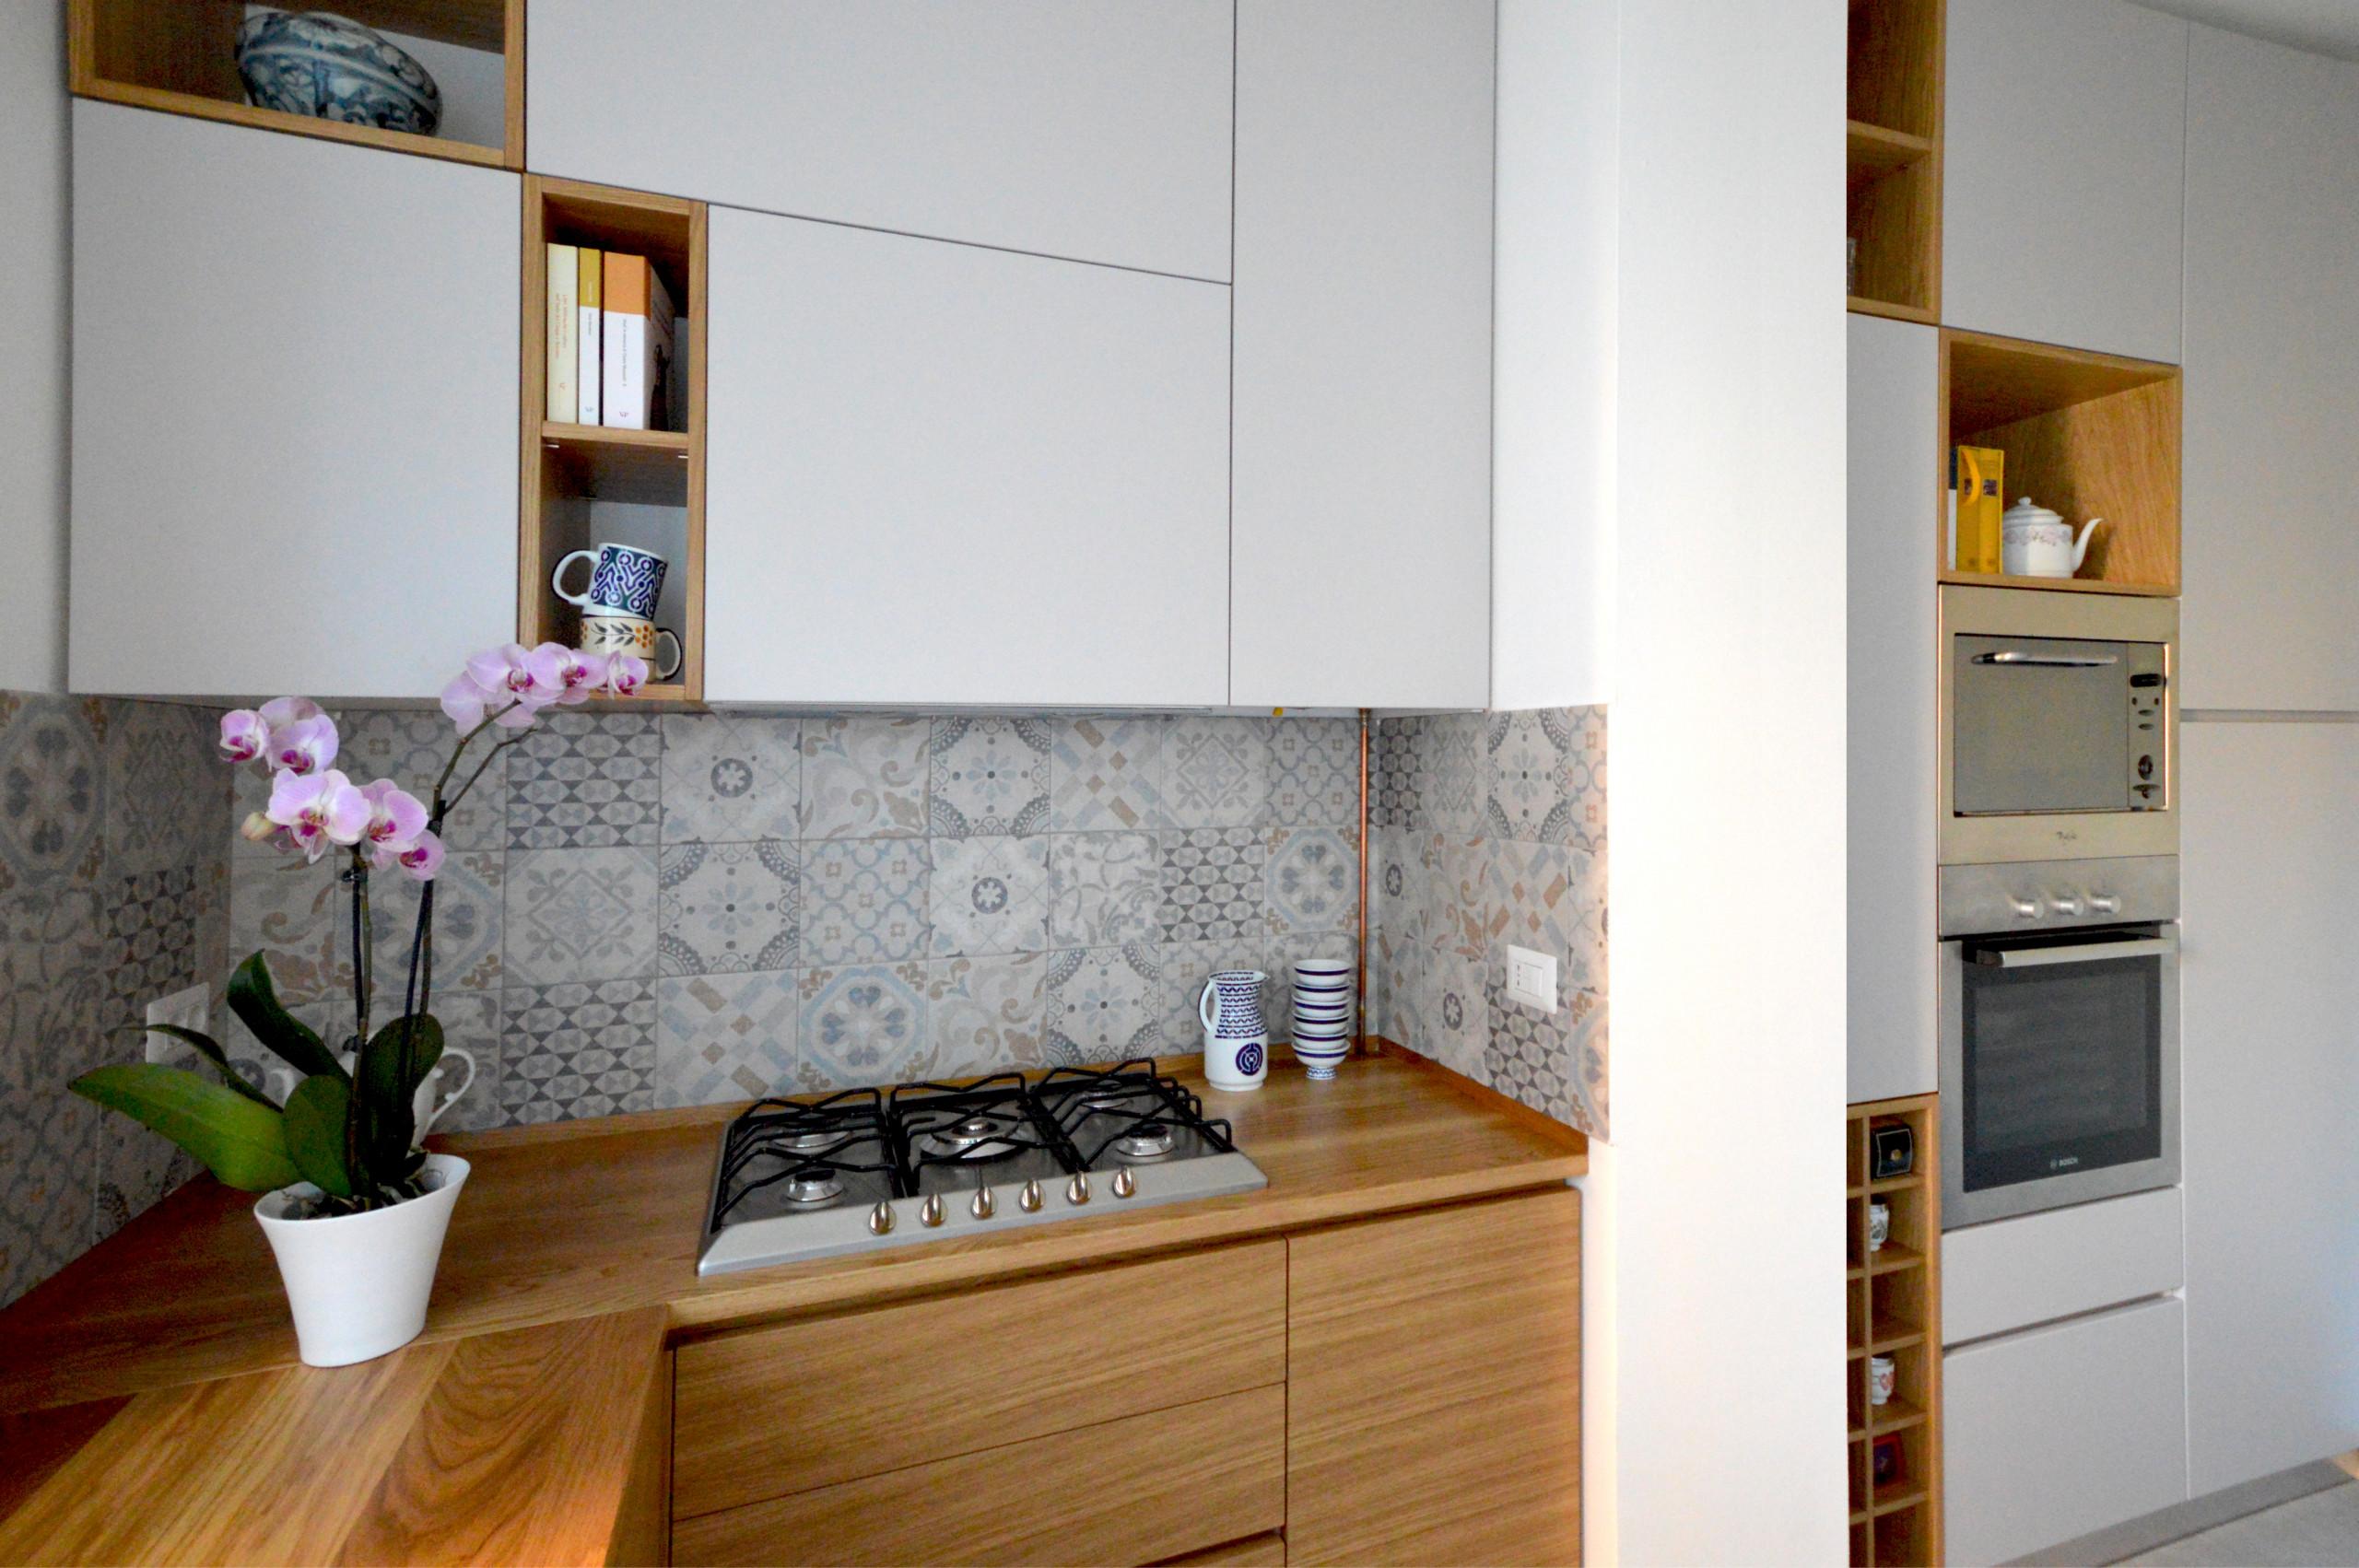 Cucina e bagno in legno naturale | 120 mq